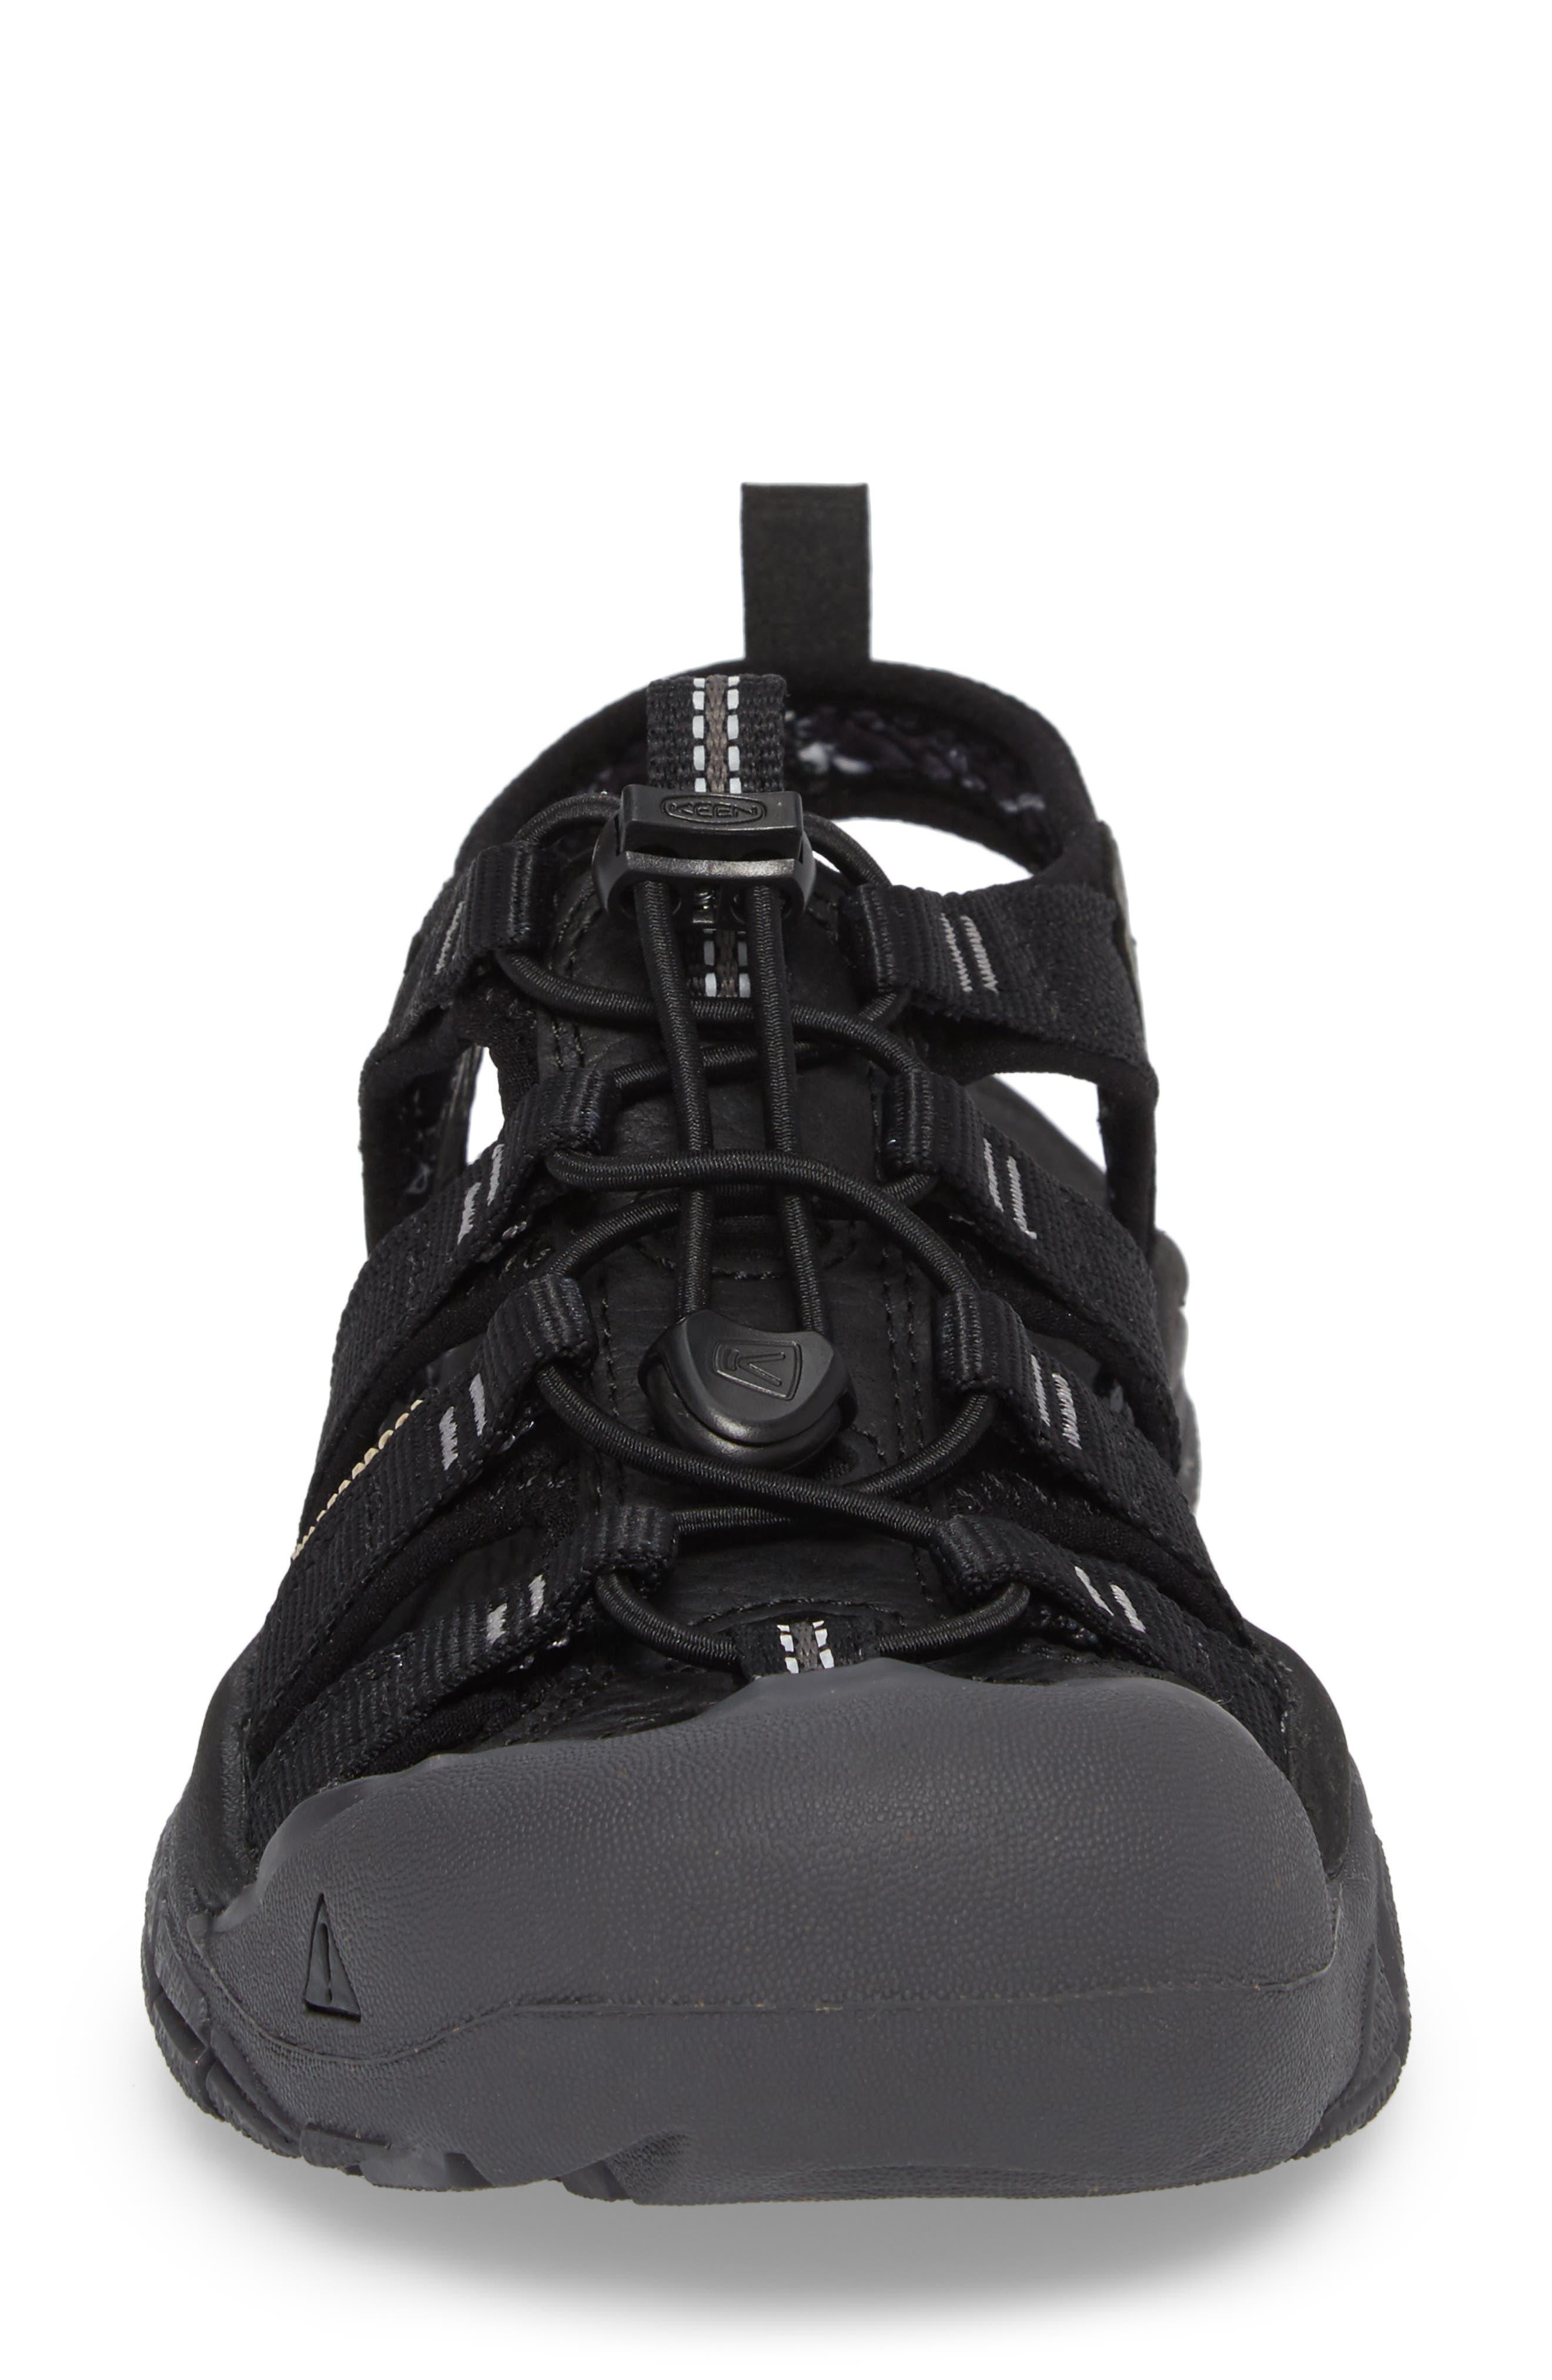 Newport Eco Waterproof Sandal,                             Alternate thumbnail 4, color,                             Black/ Magnet